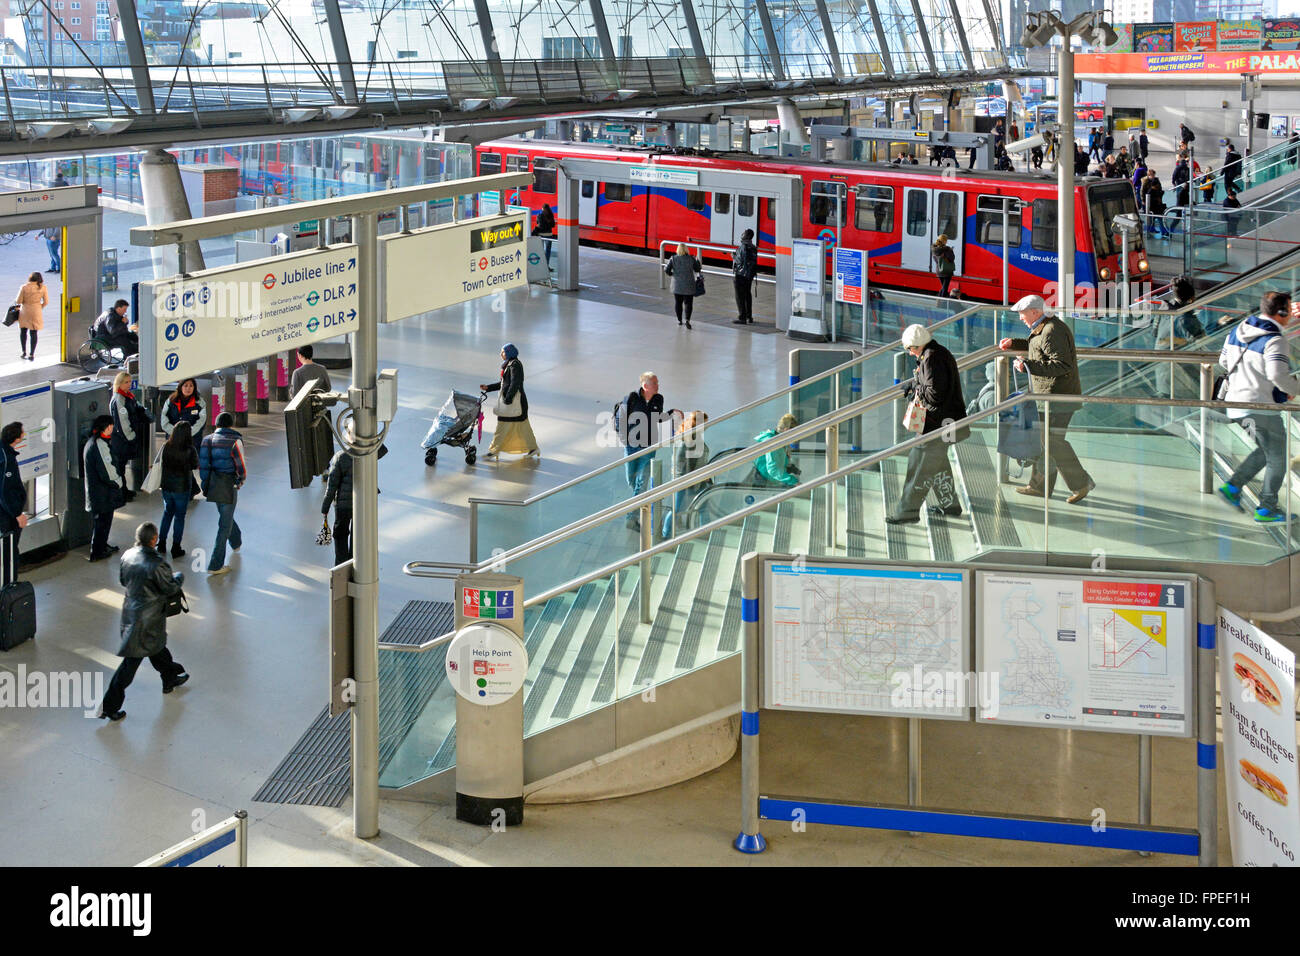 Interior Stratford London UK train station interchange concourse for Docklands Light Railway service at platform - Stock Image